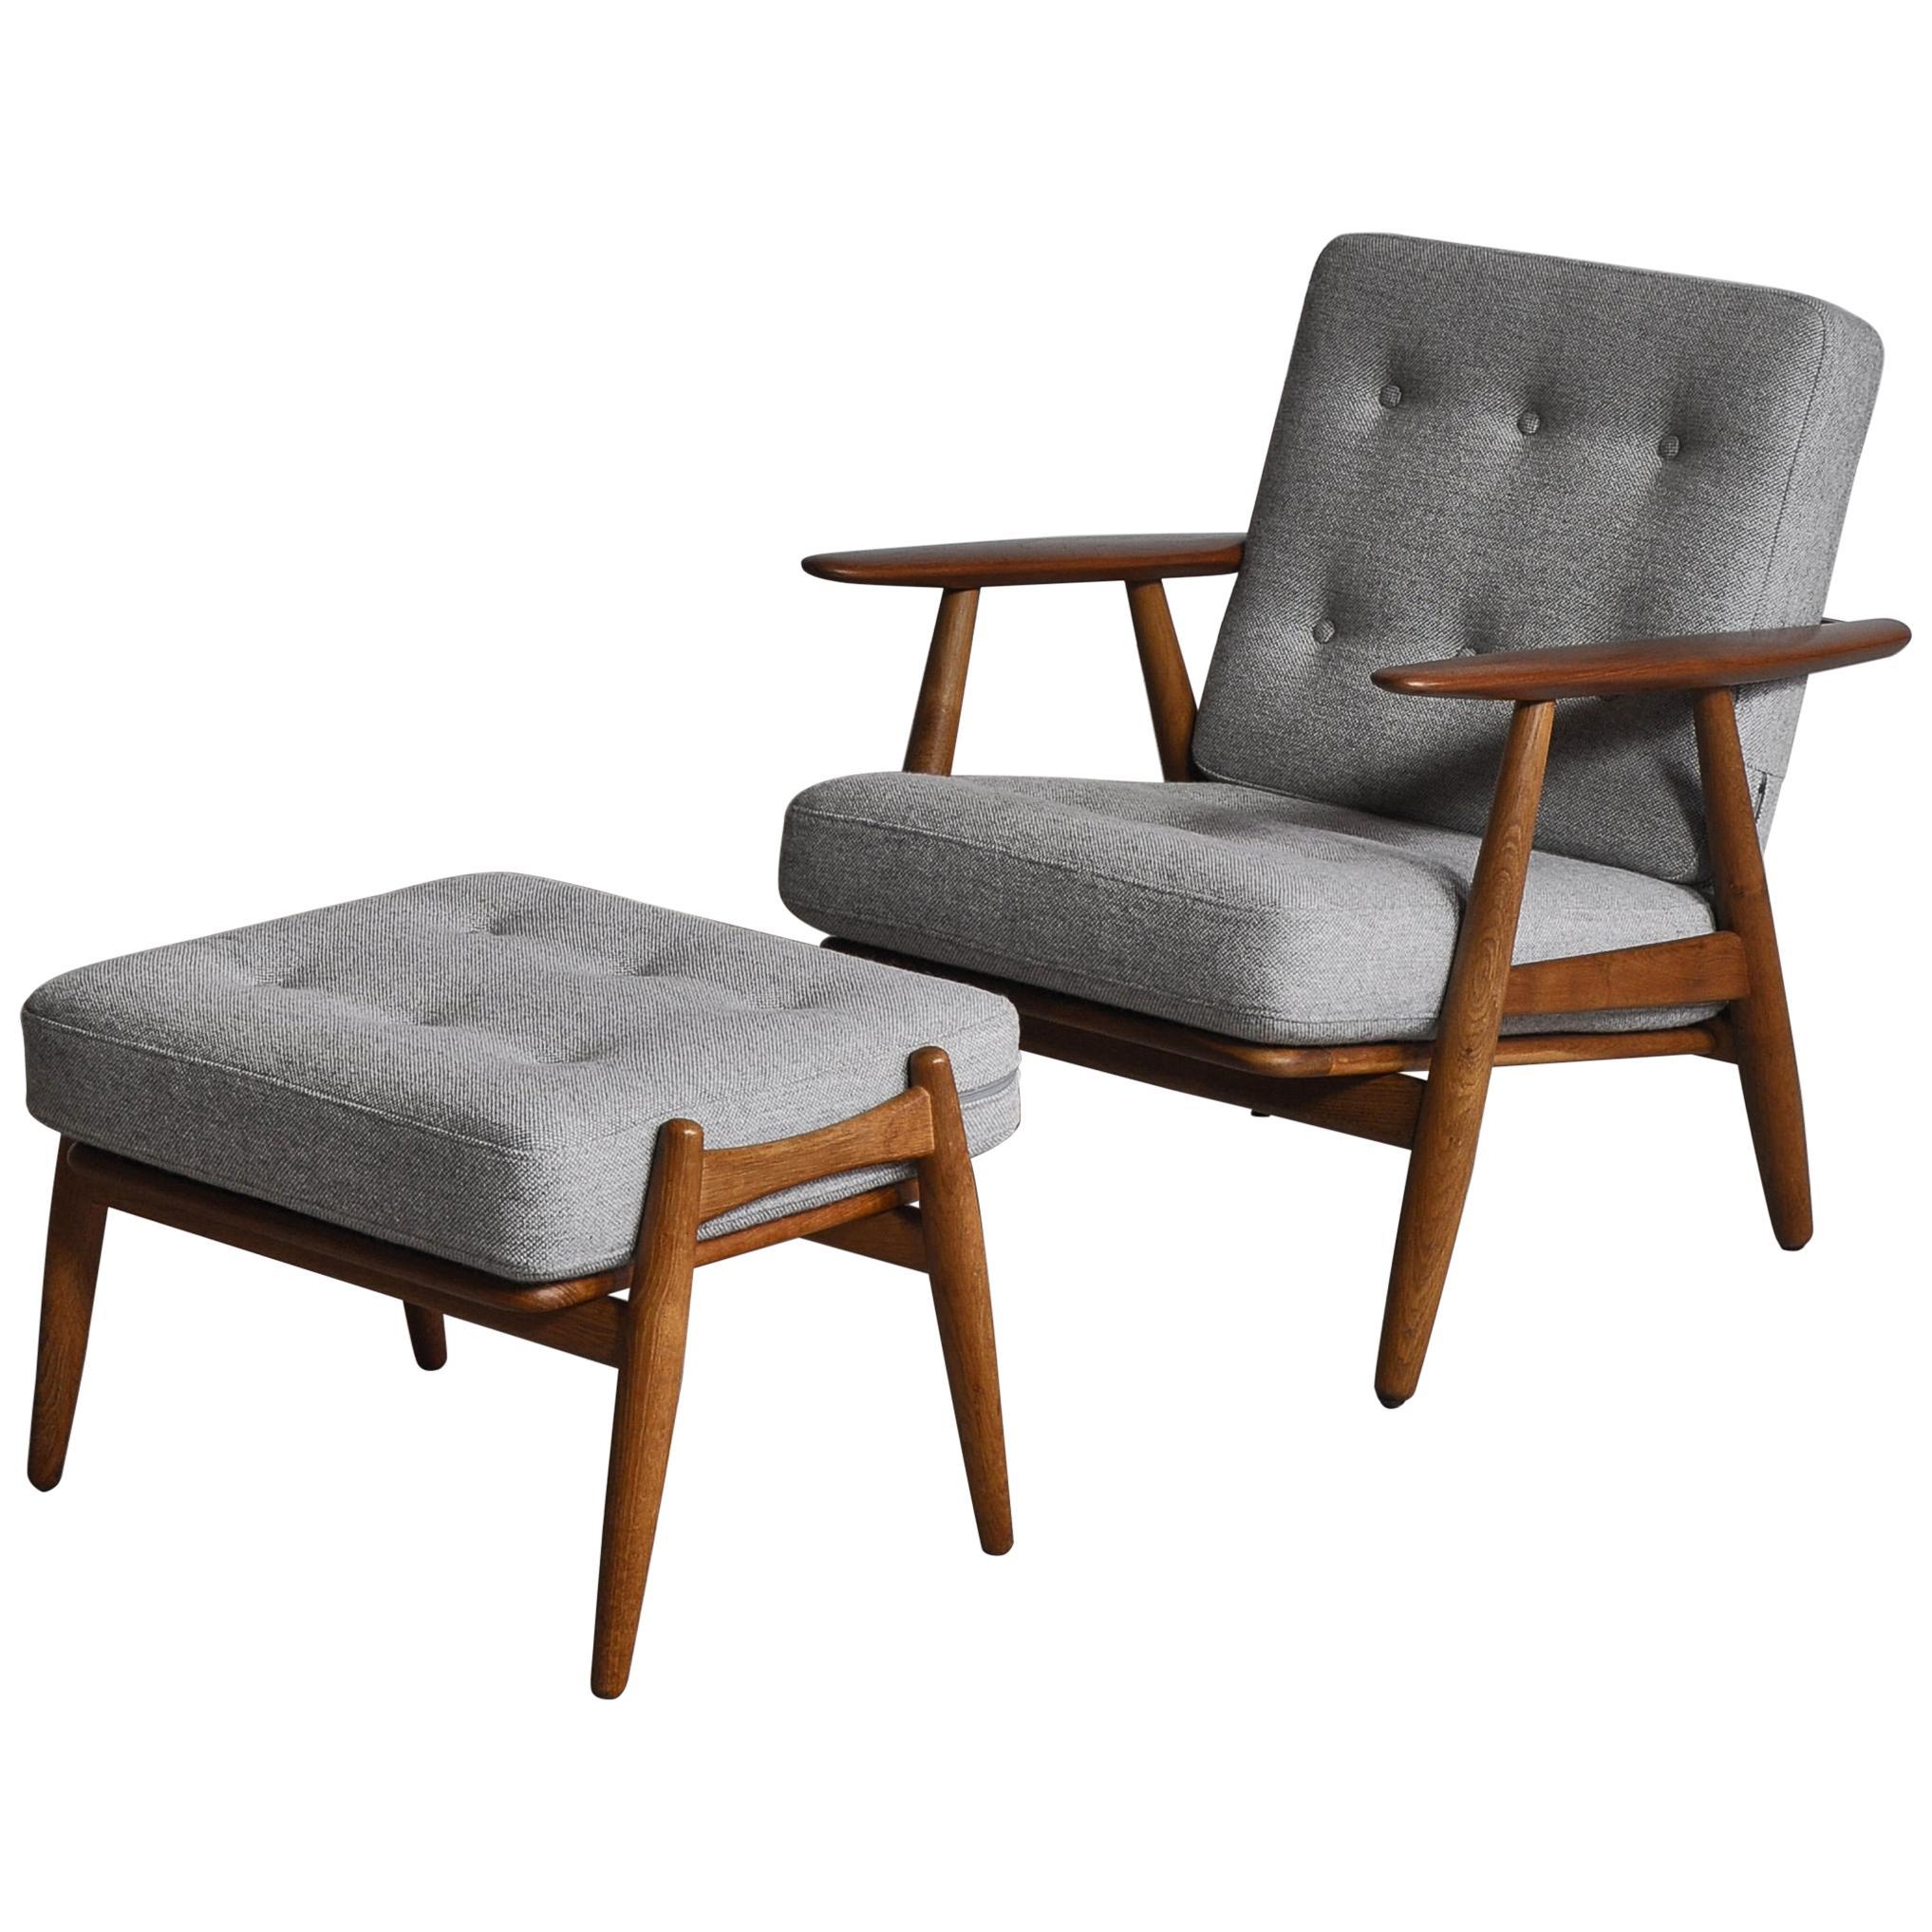 Hans J. Wegner Set of Lounge Chair Model GE-240 & Ottoman in Oak and Teak, 1950s